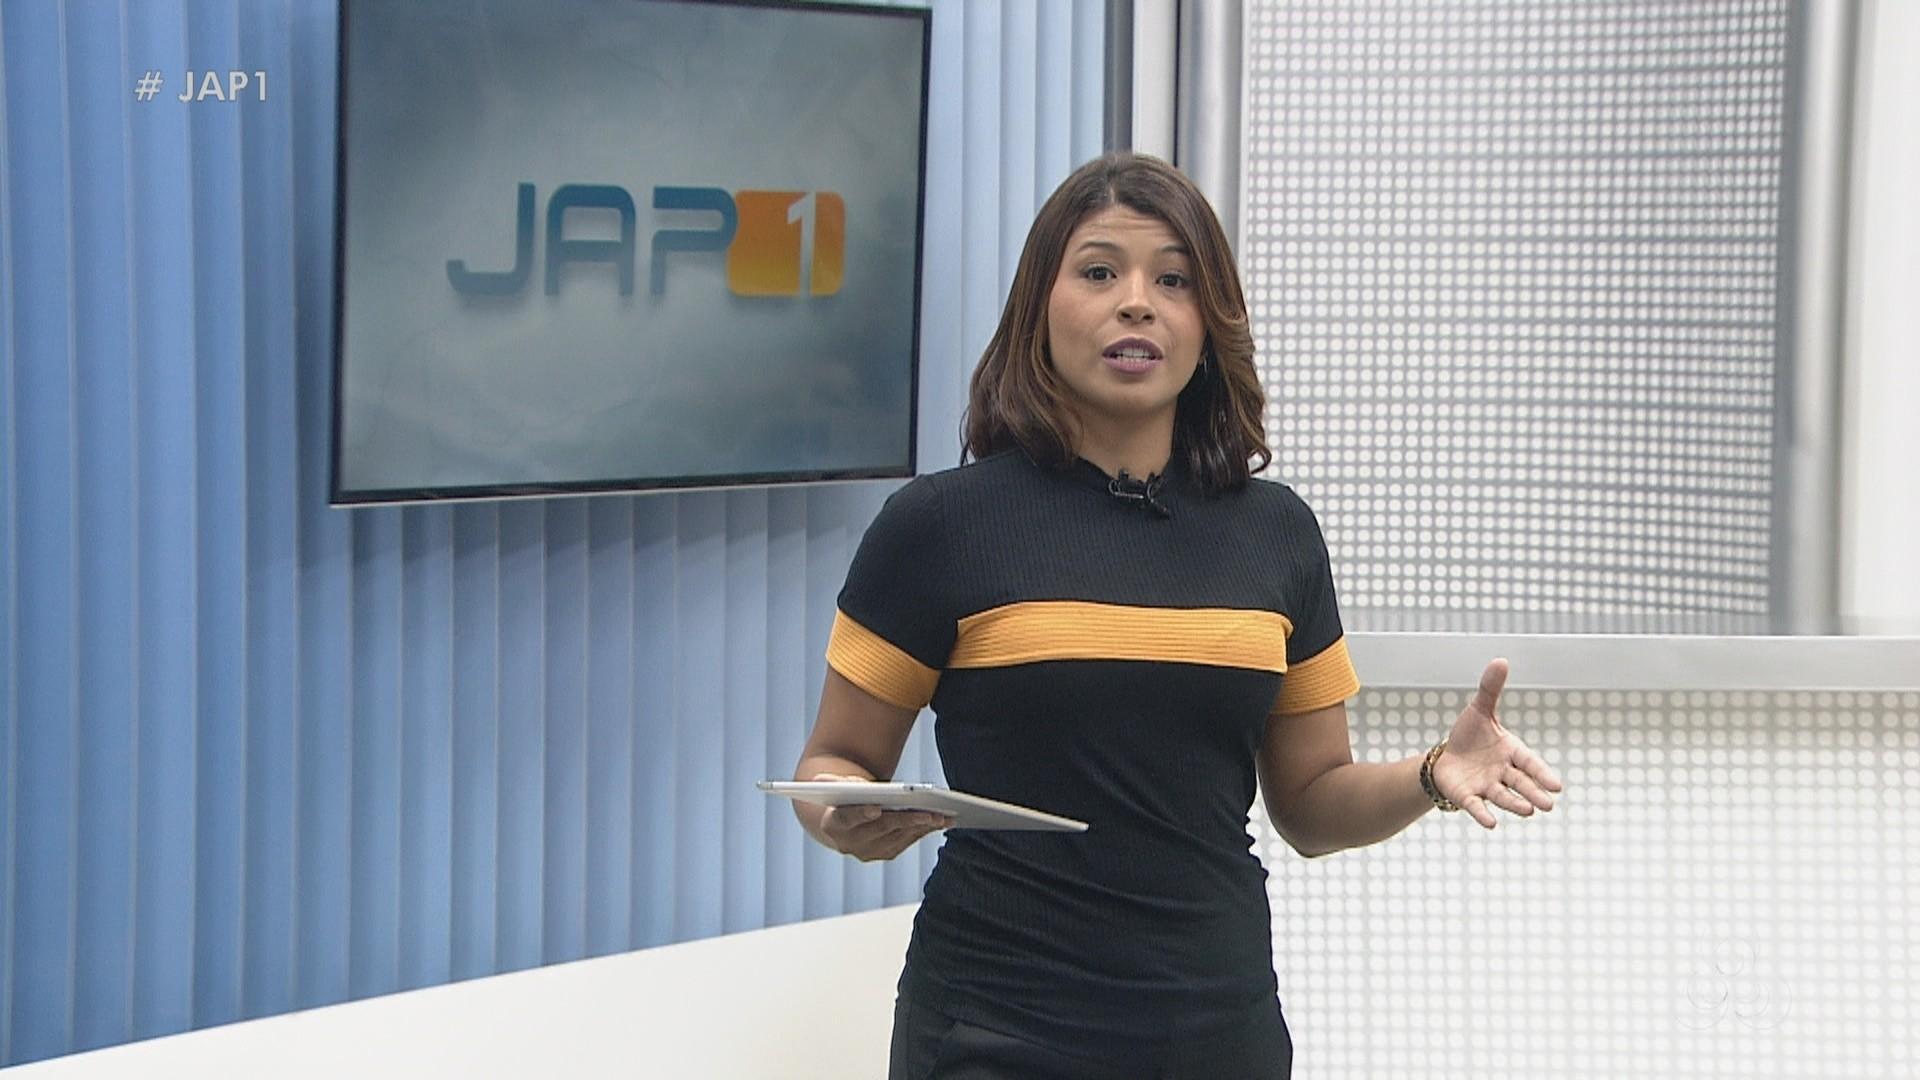 VÍDEOS: JAP1 de sexta-feira, 24 de janeiro